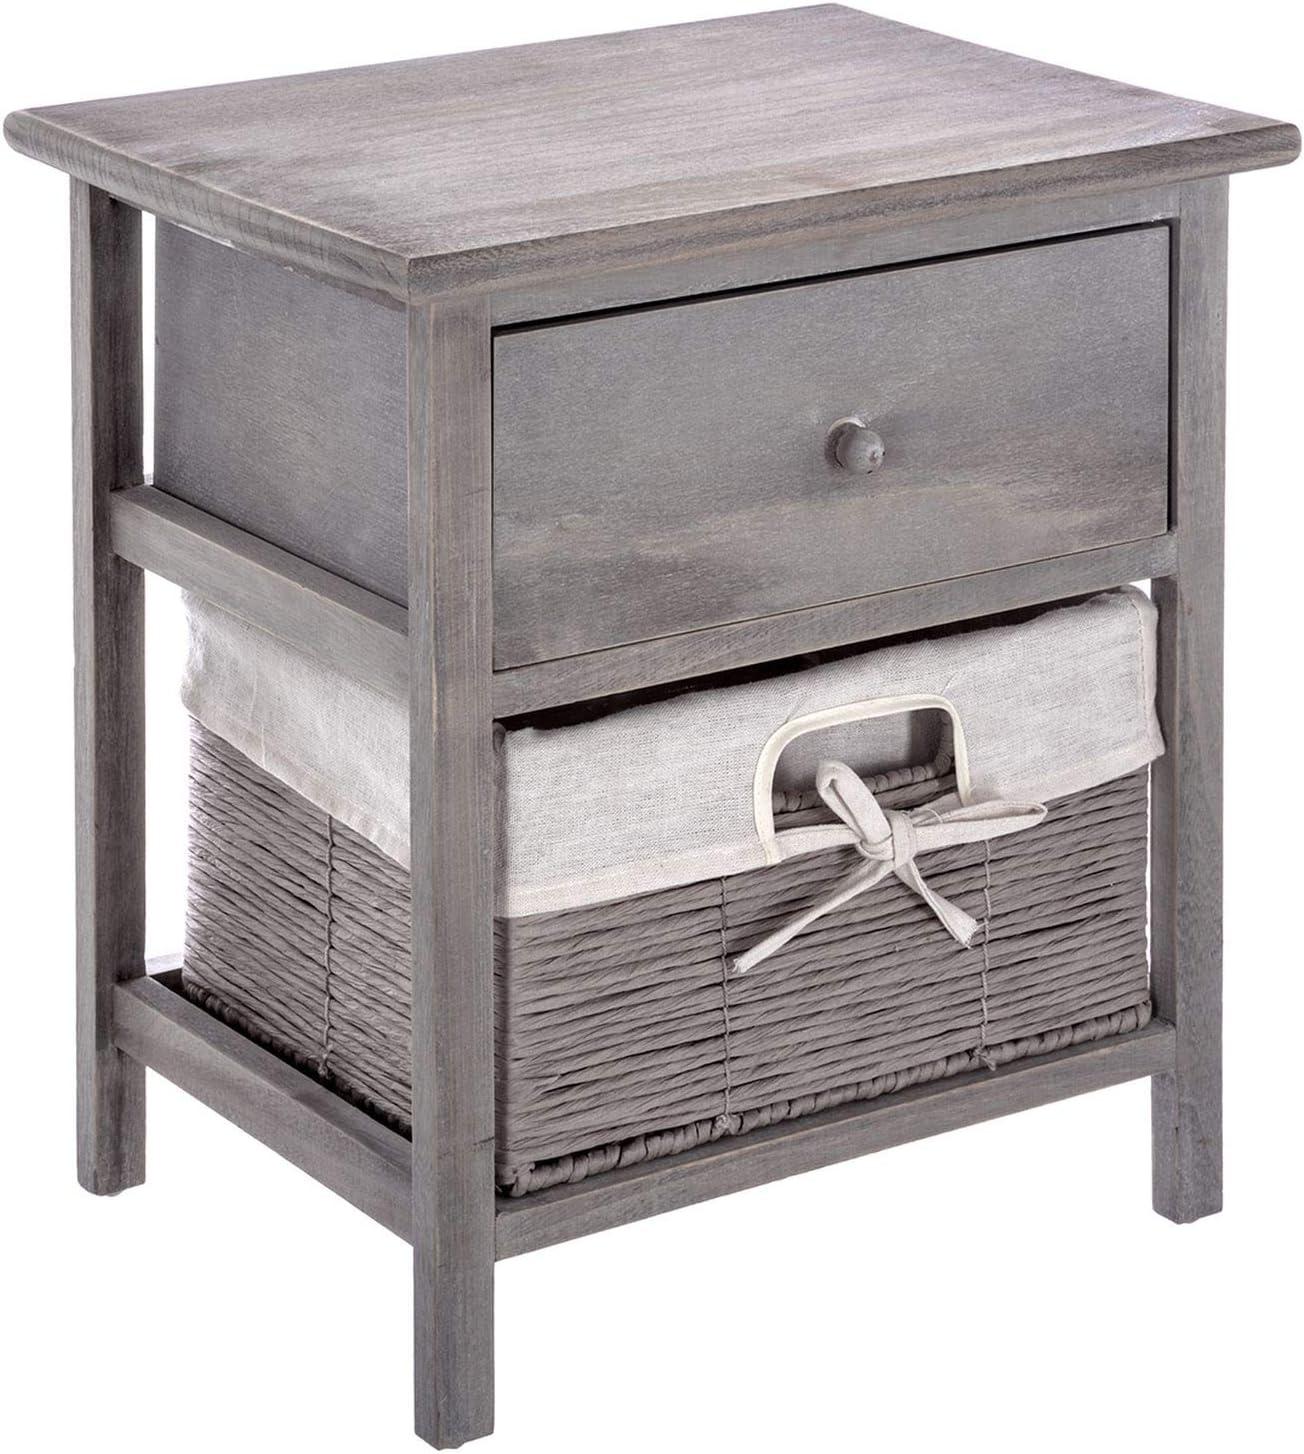 L 40 cm iDiffusion Table de Chevet 1 Tiroir avec Panier Gris